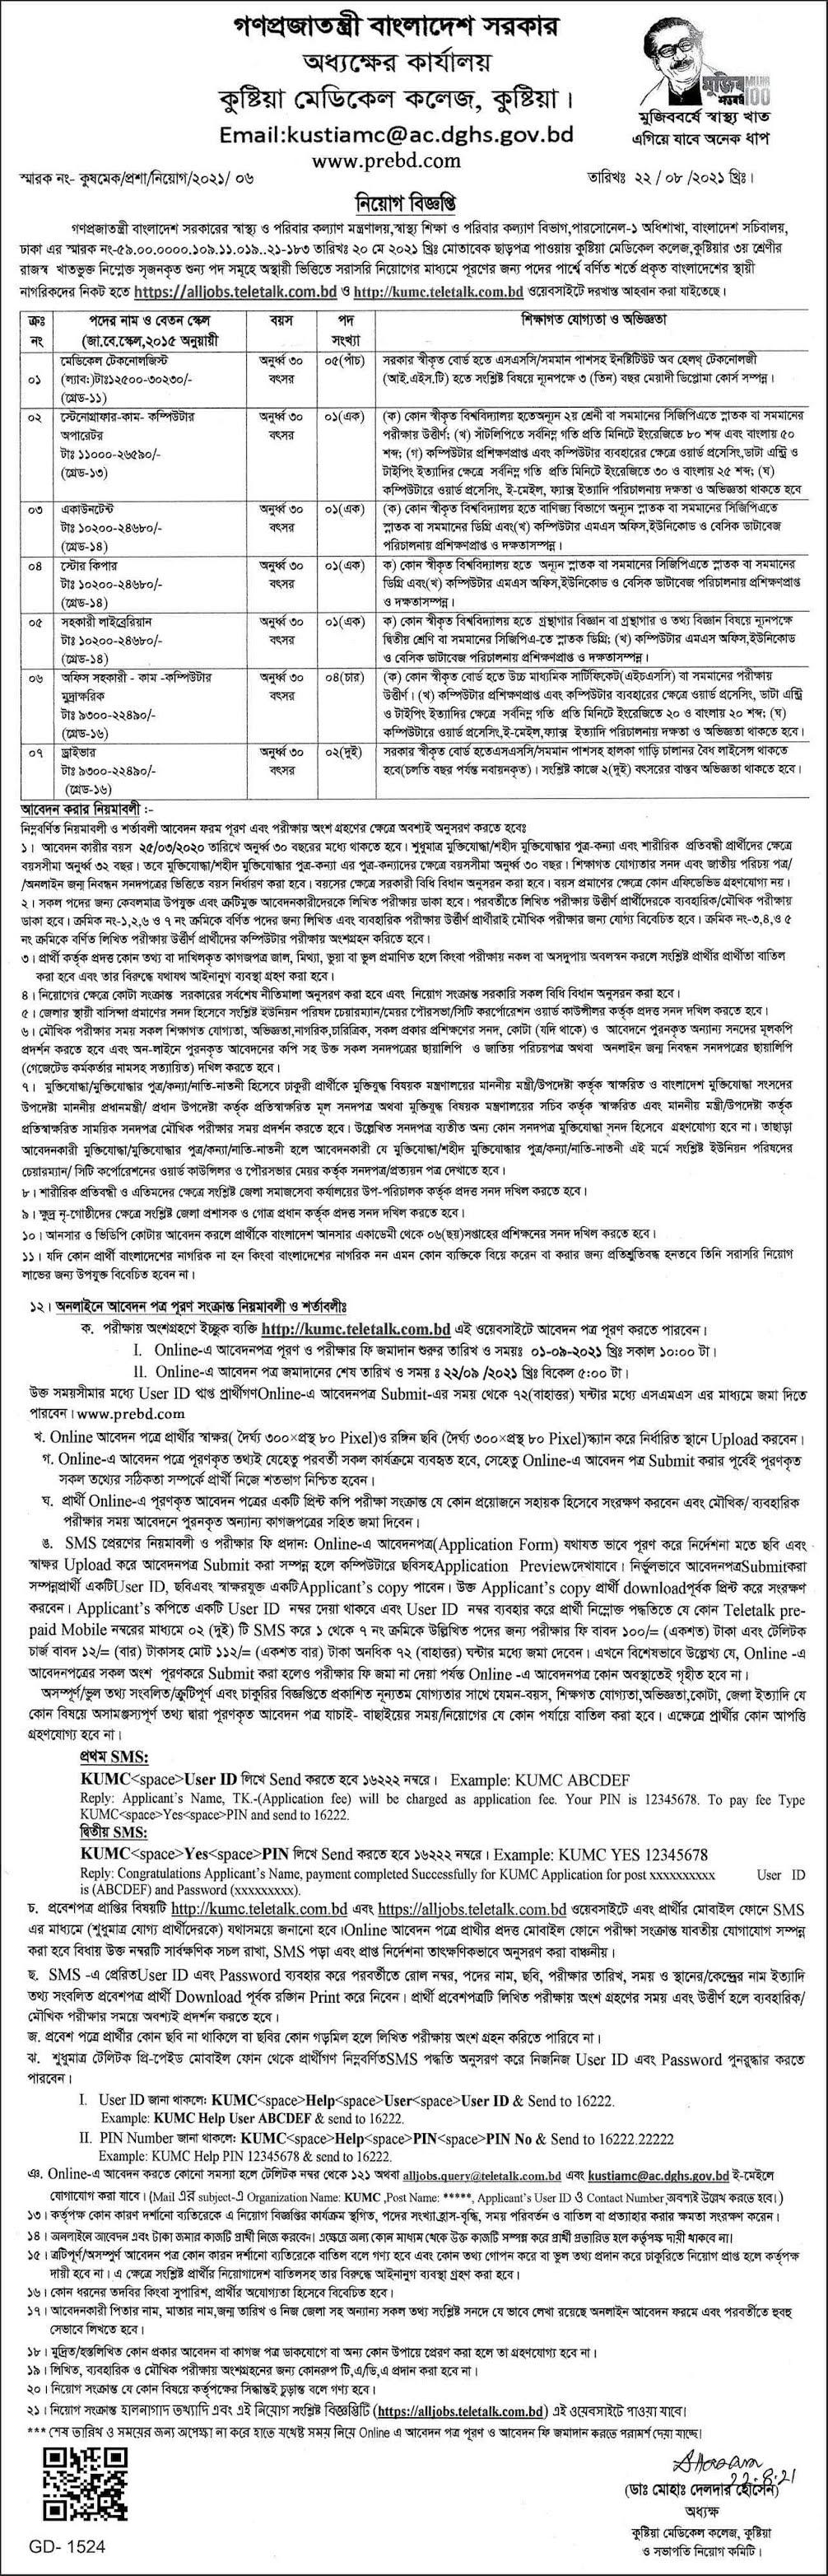 kushtia medical college job circular